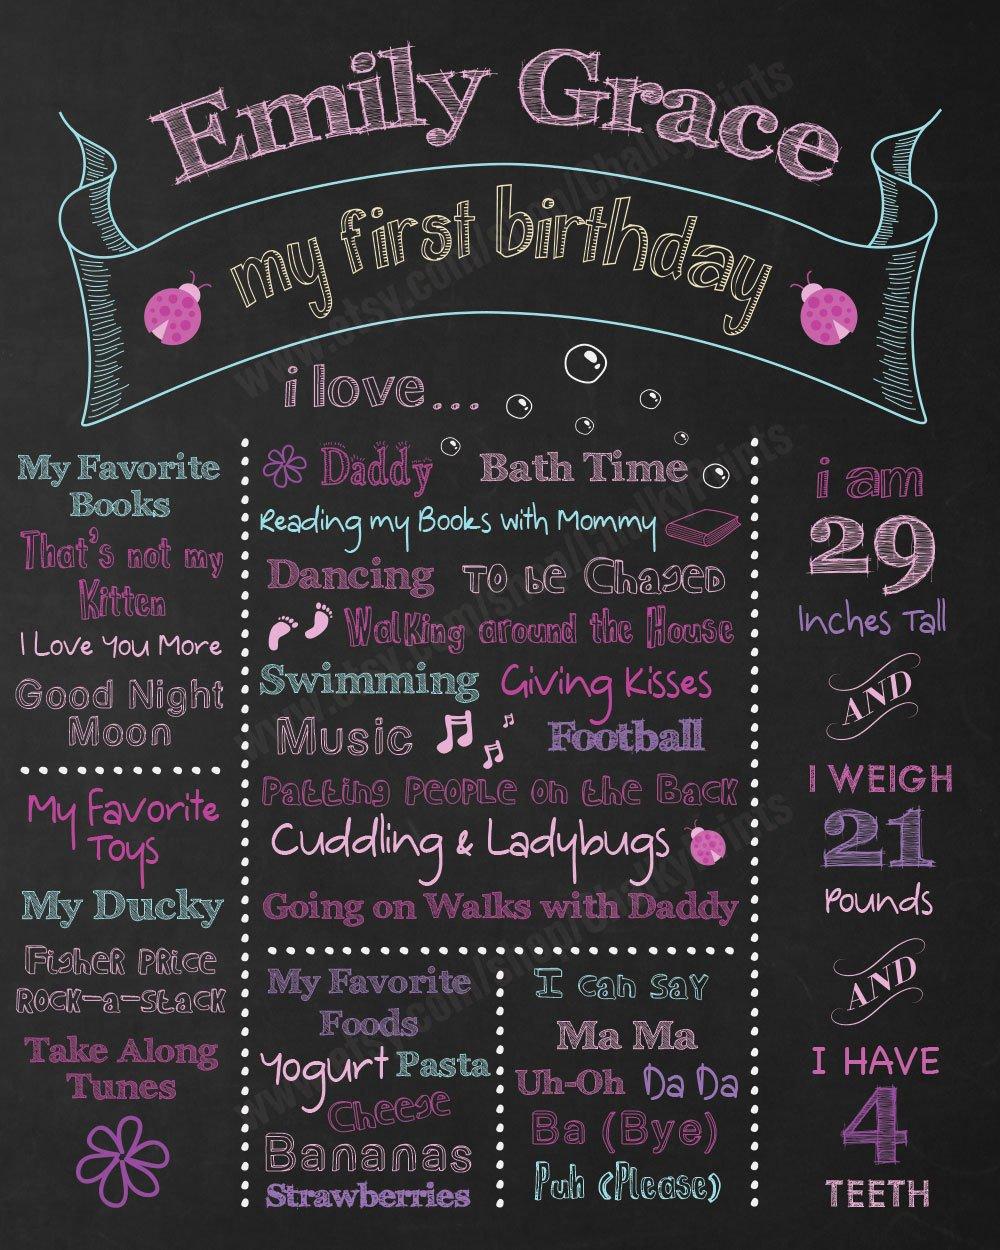 1st Birthday Chalkboard Sign Template Elegant First Birthday Chalkboard Sign Personalized & Printable